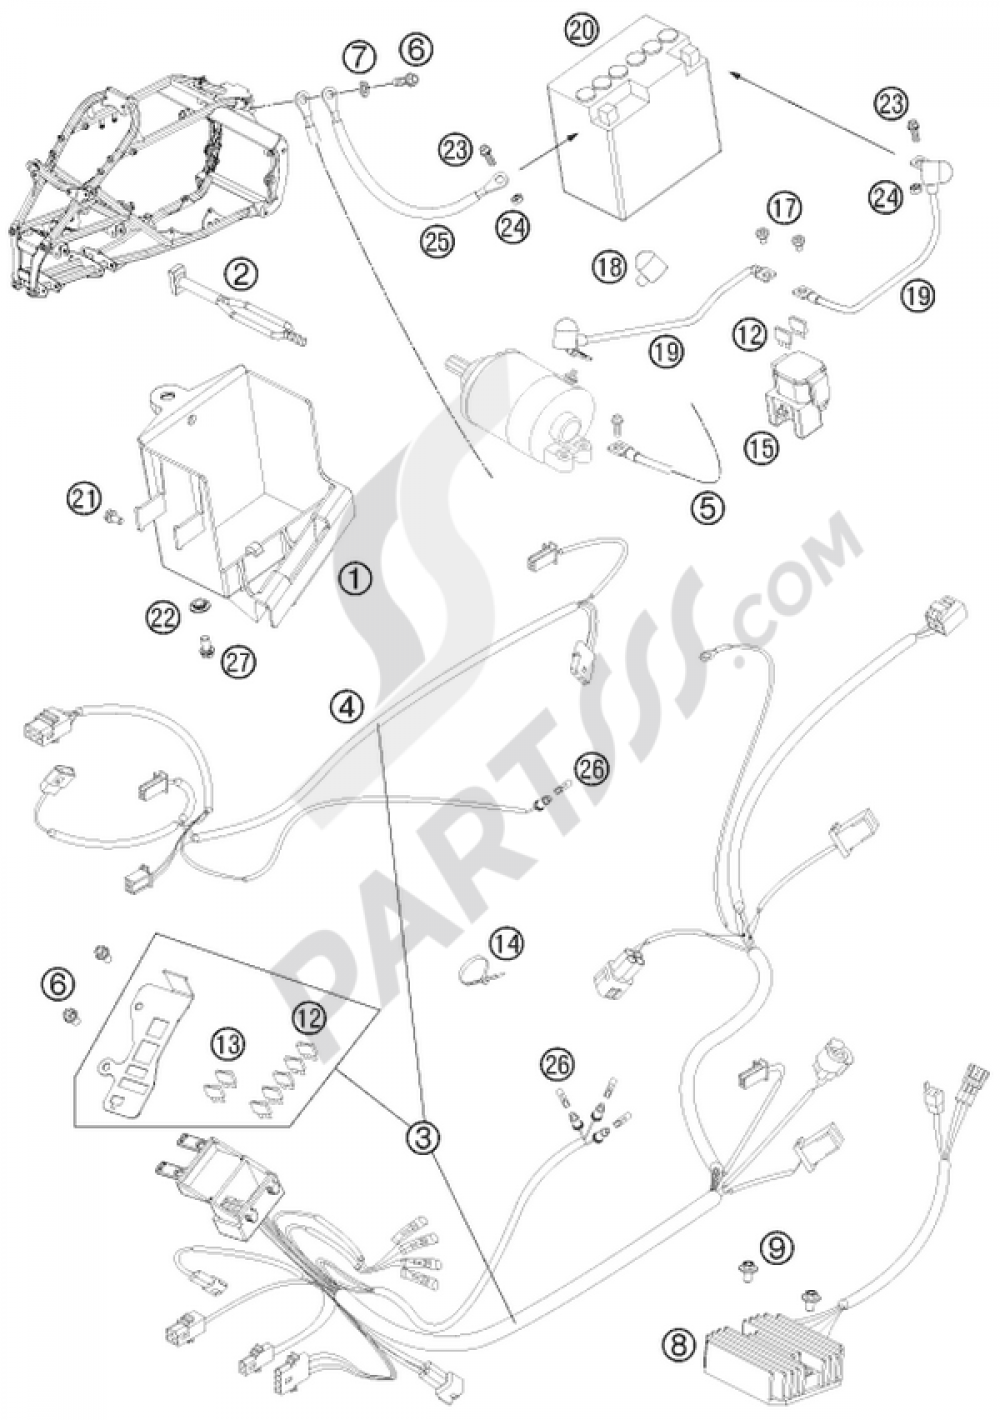 wiring harness ktm 525 xc atv 2012 eu